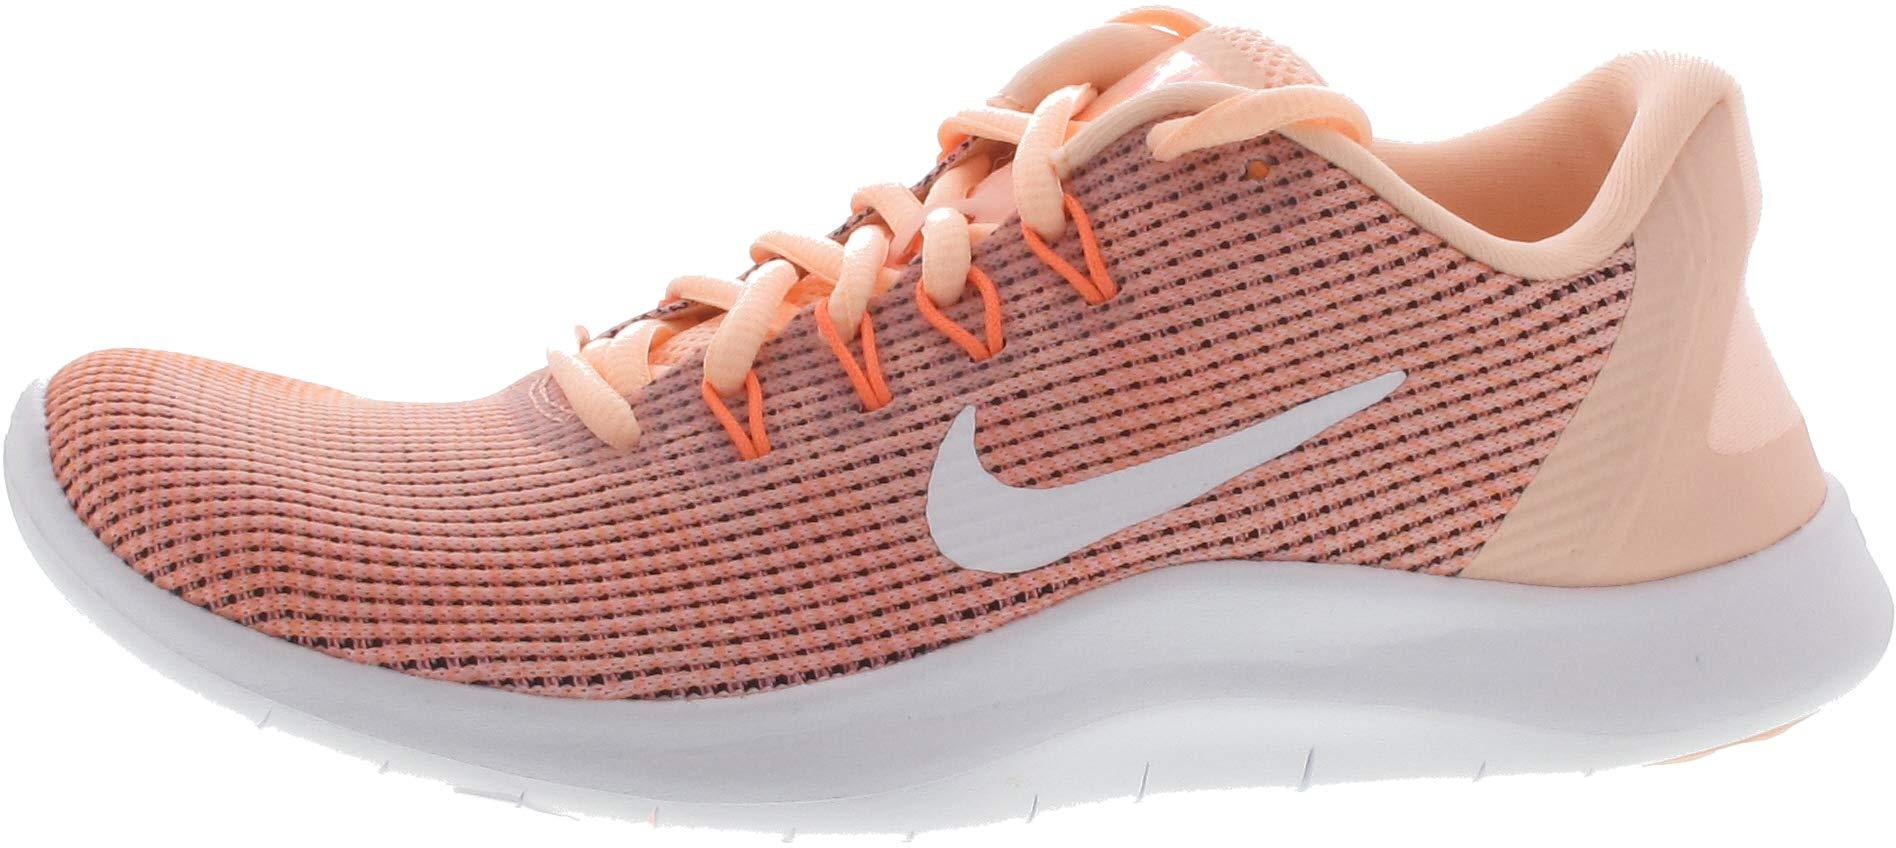 a944d6bb47dd7 Galleon - NIKE Womens Flex 2018 RN Running Shoes (9 B(M) US